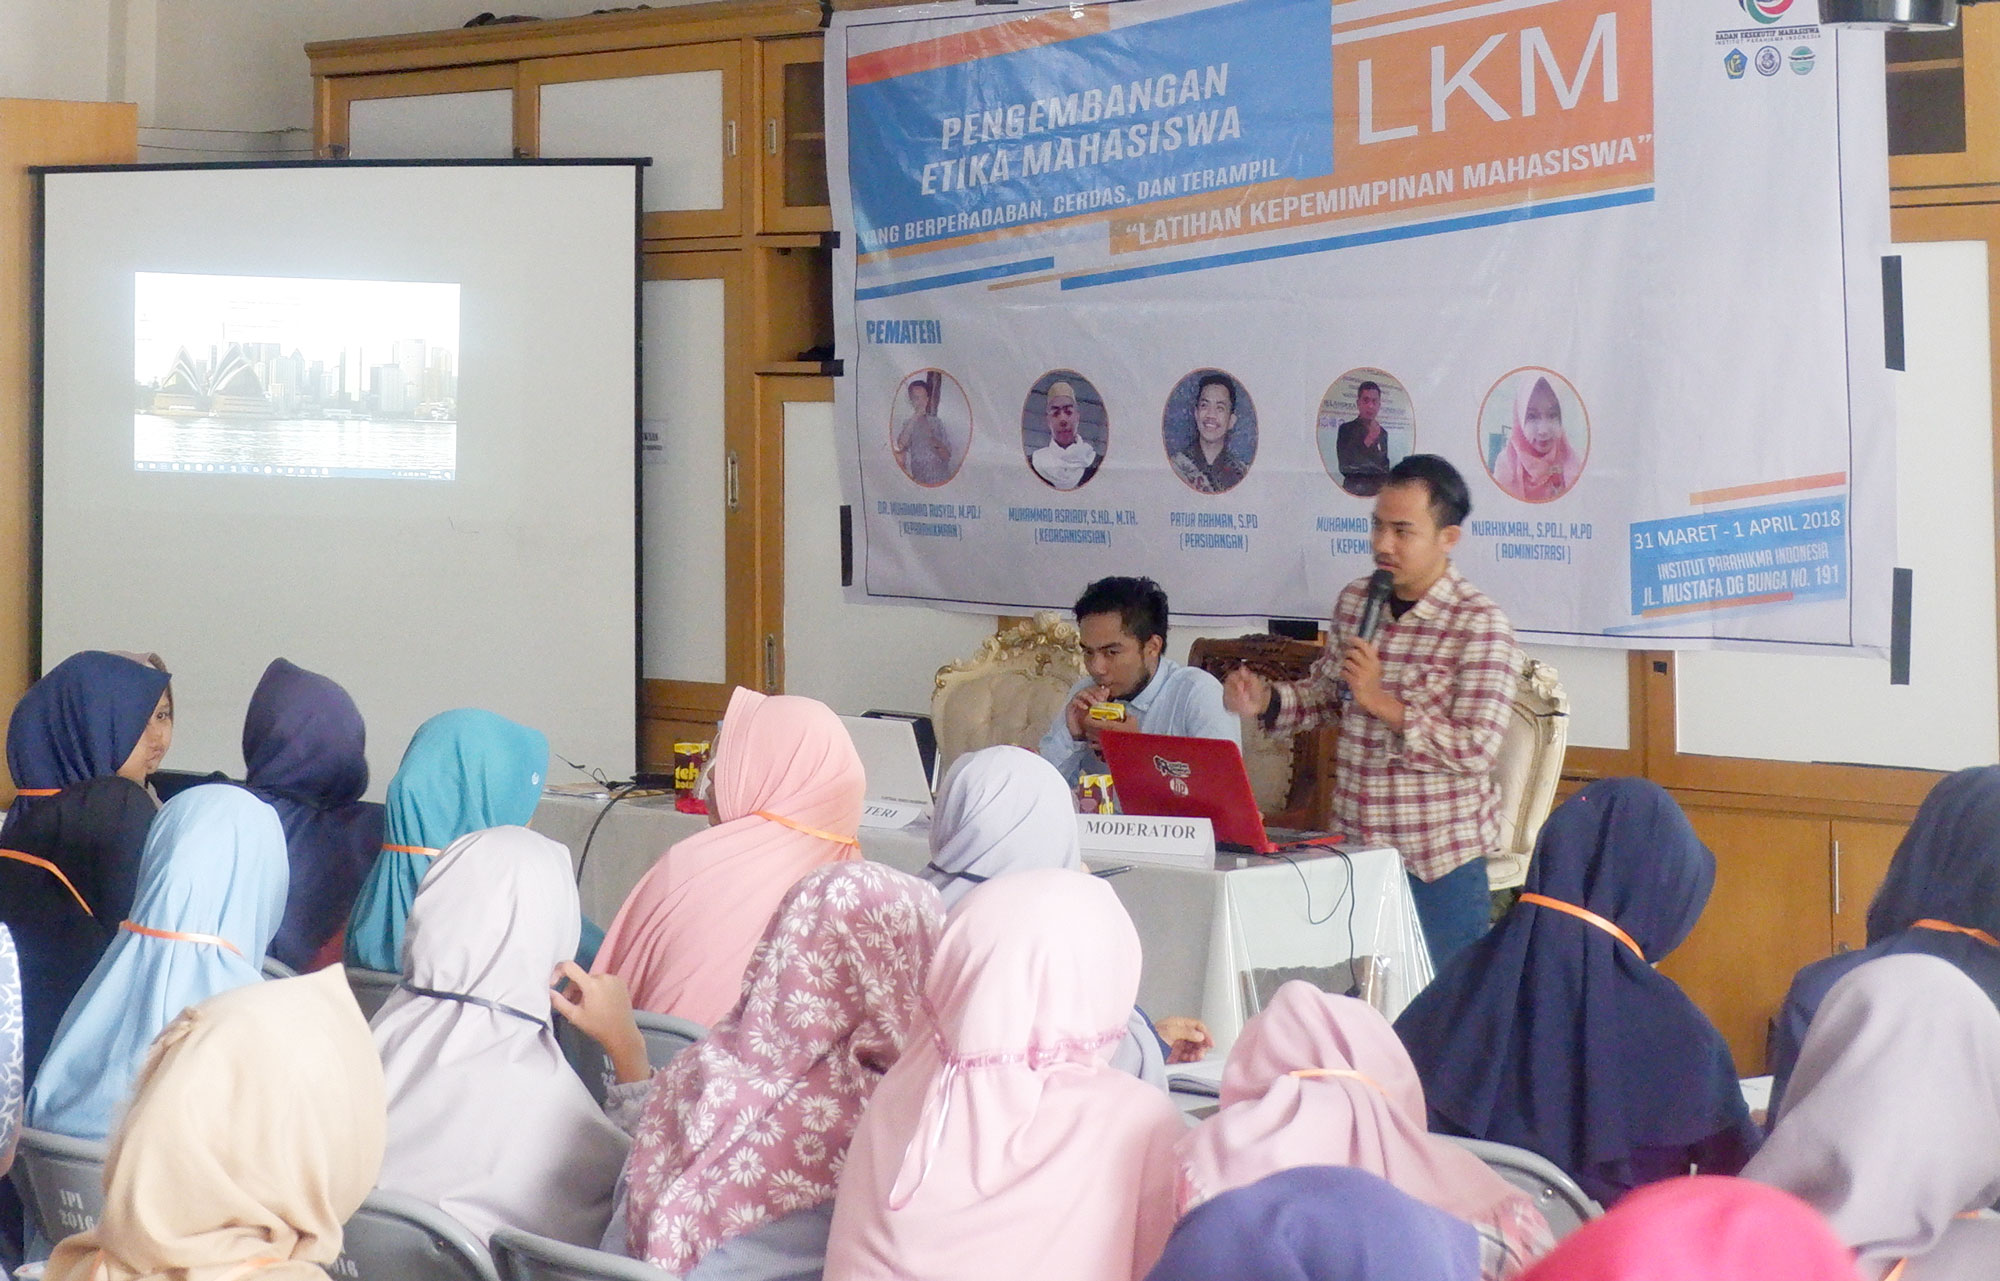 Indonesia krisis kepimimpinan, IPI Solusinya